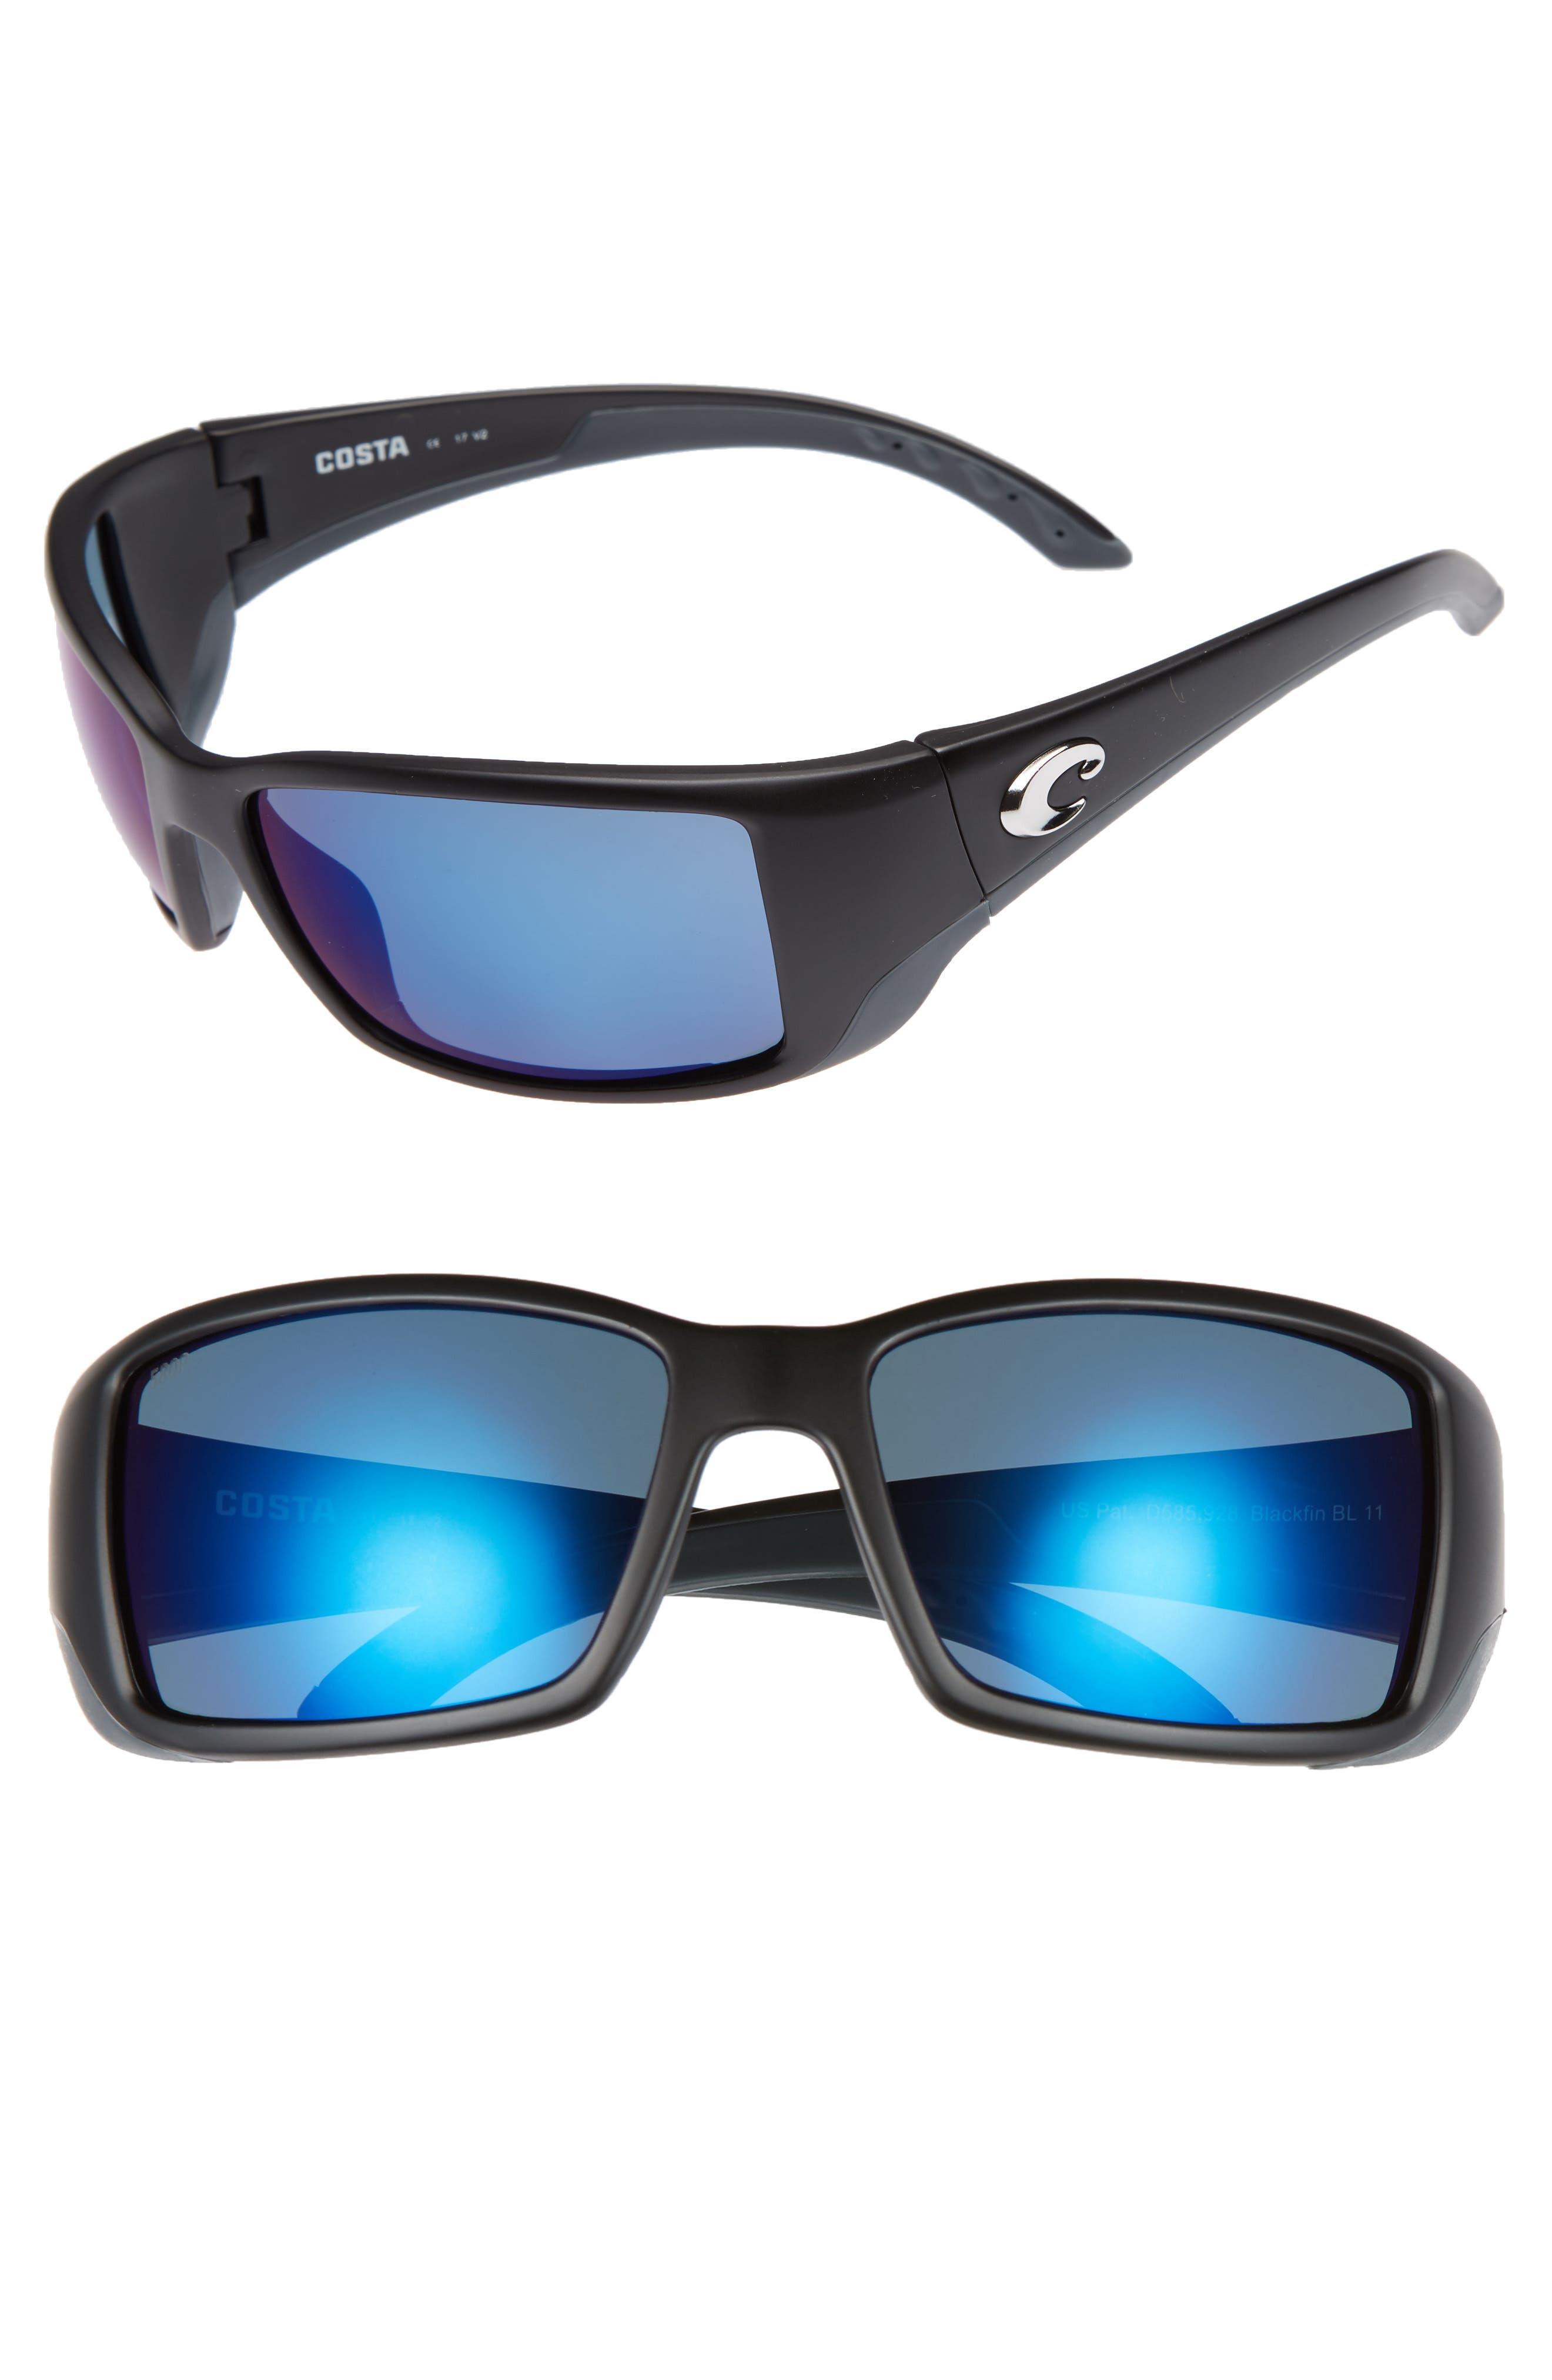 Blackfin 60mm Polarized Sunglasses,                             Main thumbnail 1, color,                             001